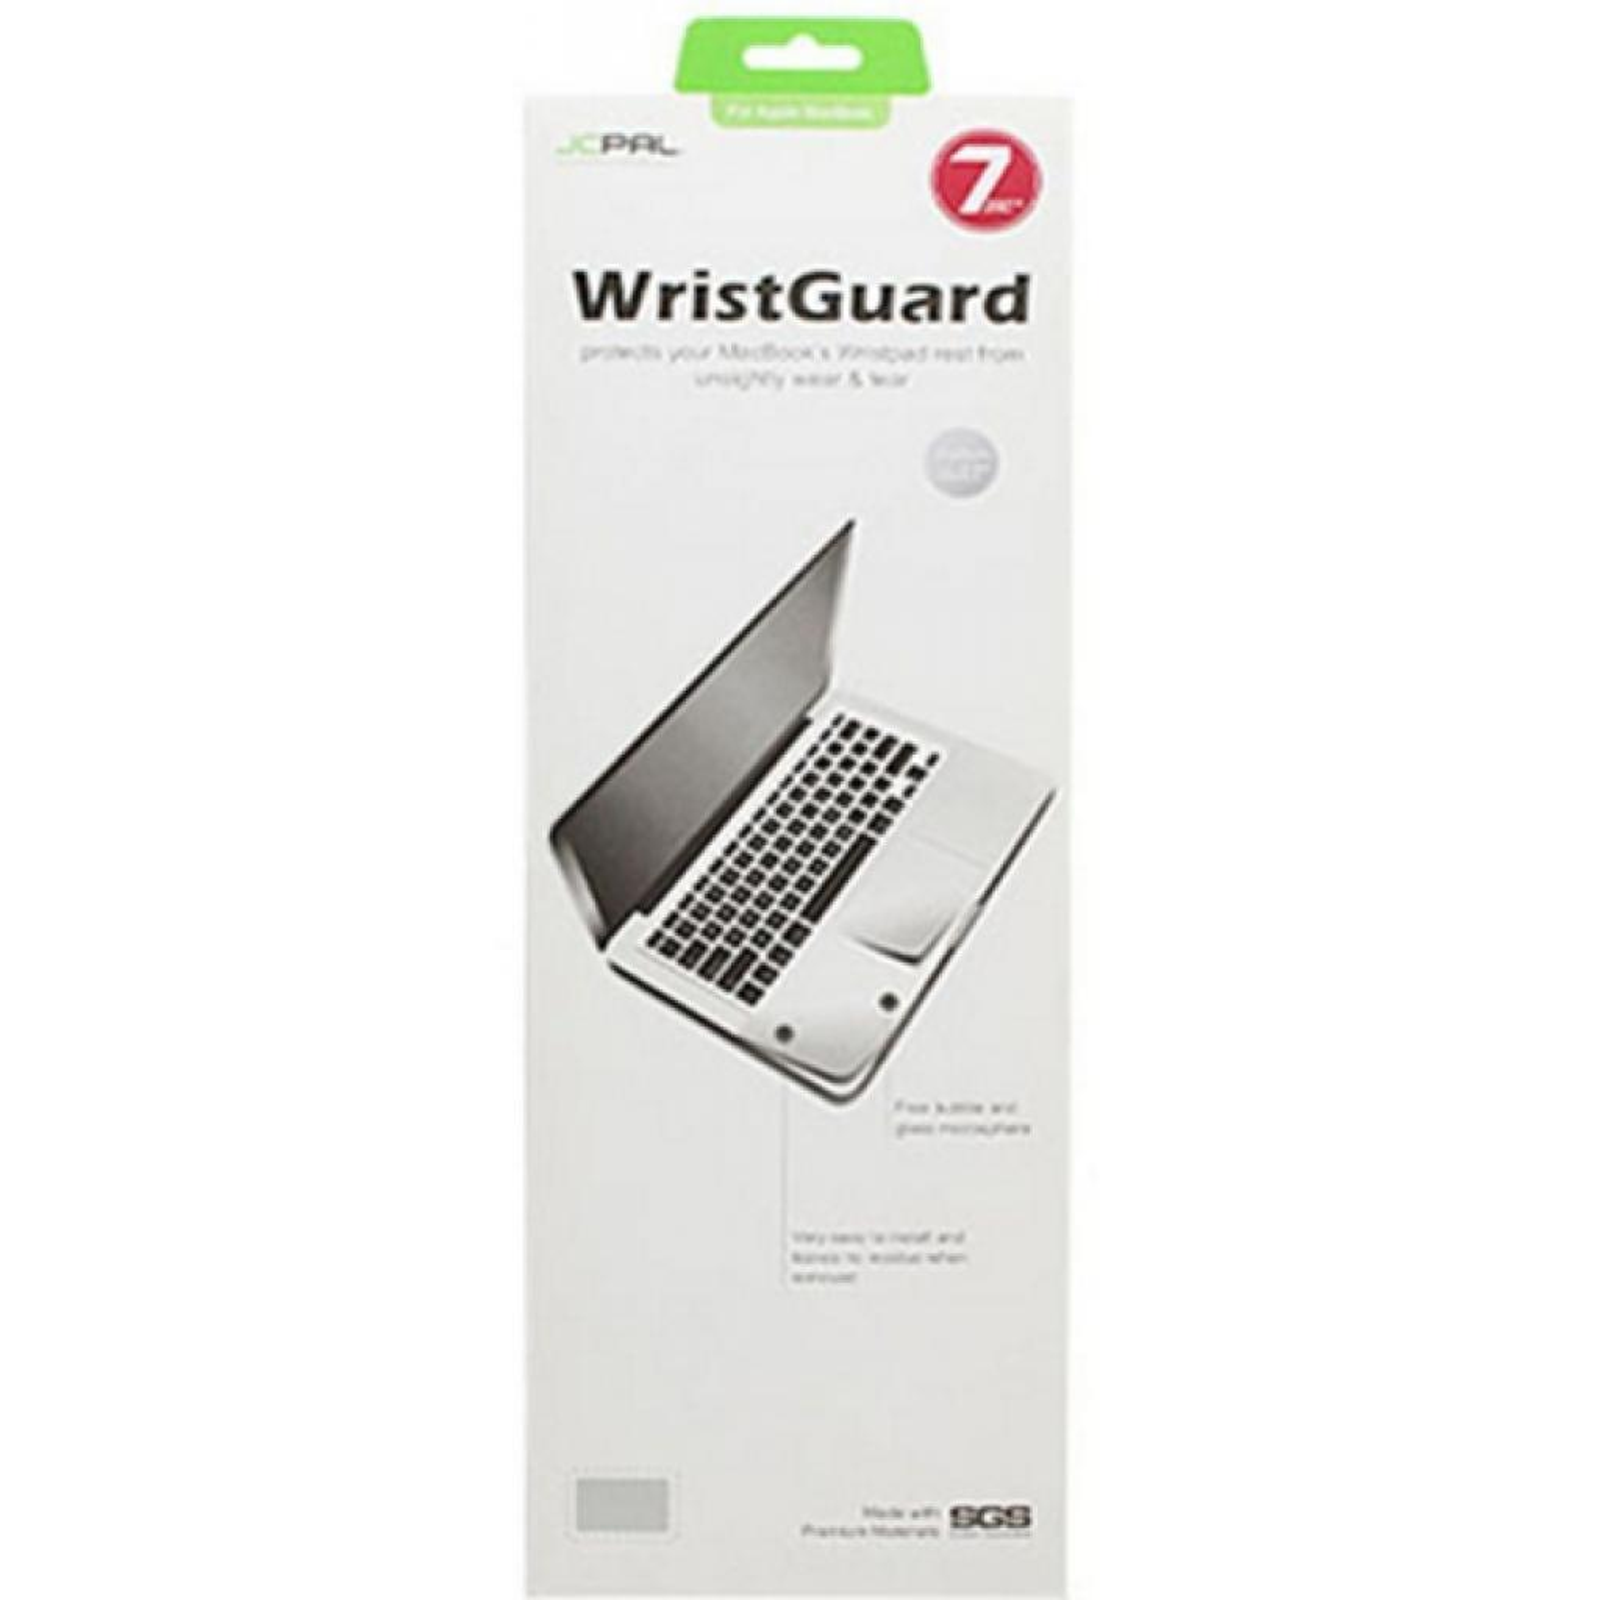 Пленка защитная JCPAL WristGuard Palm Guard для Retina-MBP 15 (JCP2026)